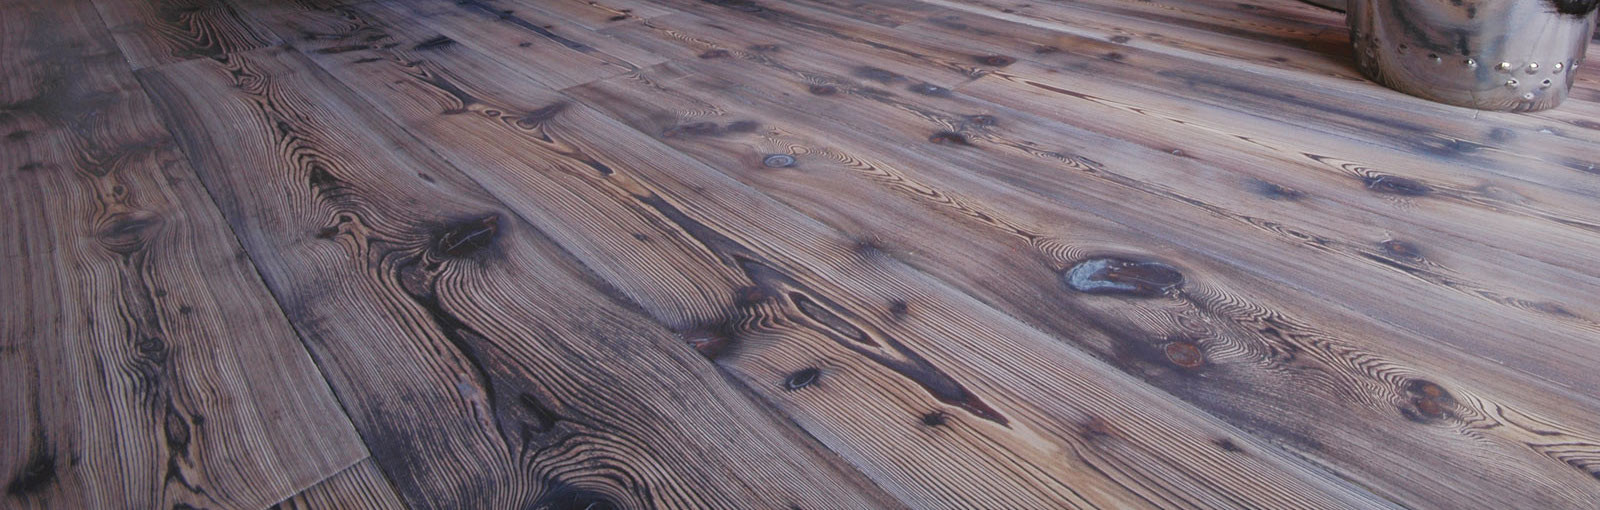 most popular hardwood flooring 2017 of hardwood westfloors west vancouver hardwood flooring carpet inside hardwood westfloors west vancouver hardwood flooring carpet laminate floors tiles bamboo cork west vancouver flooring design center